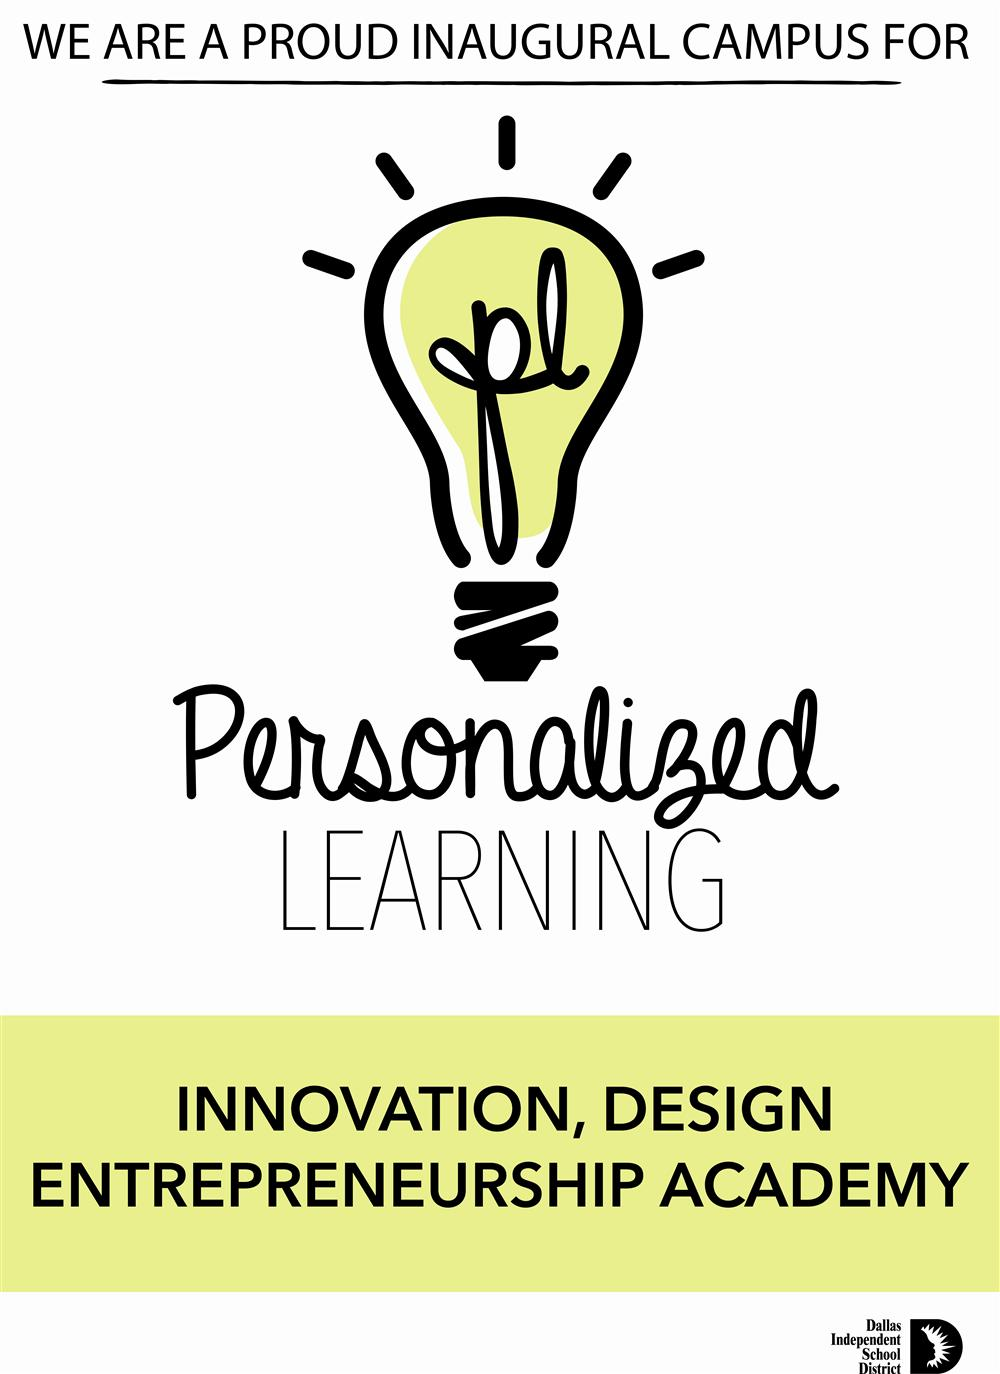 Idea Innovation Design Entrepreneurship Academy